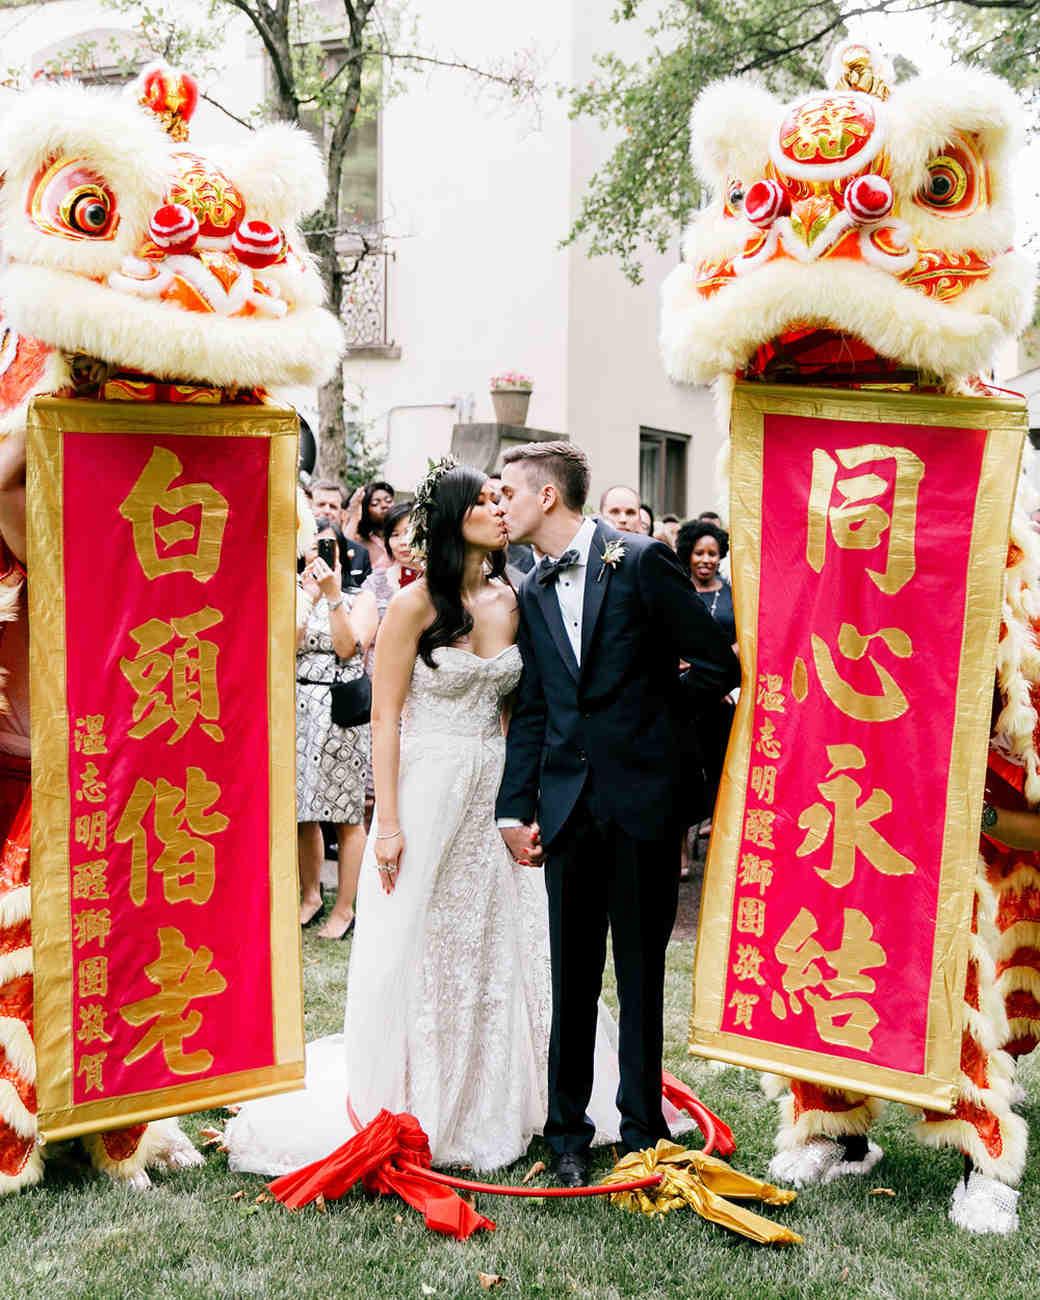 susan-tom-wedding-couple-254-s112692-0316.jpg